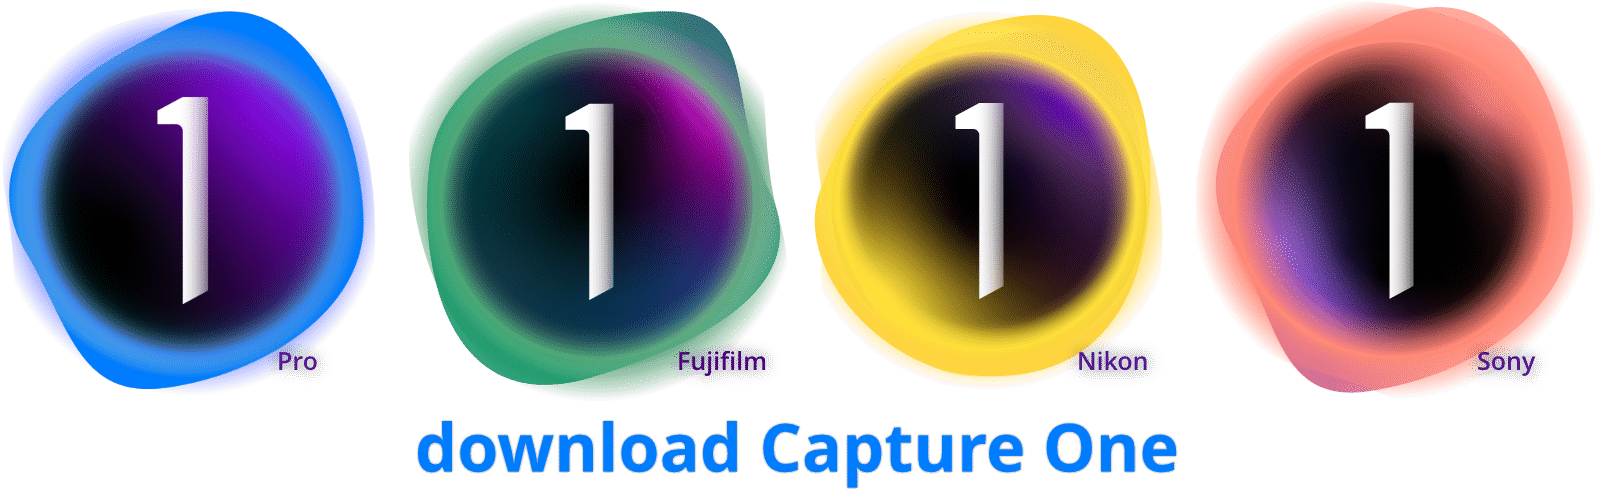 download capture one banner